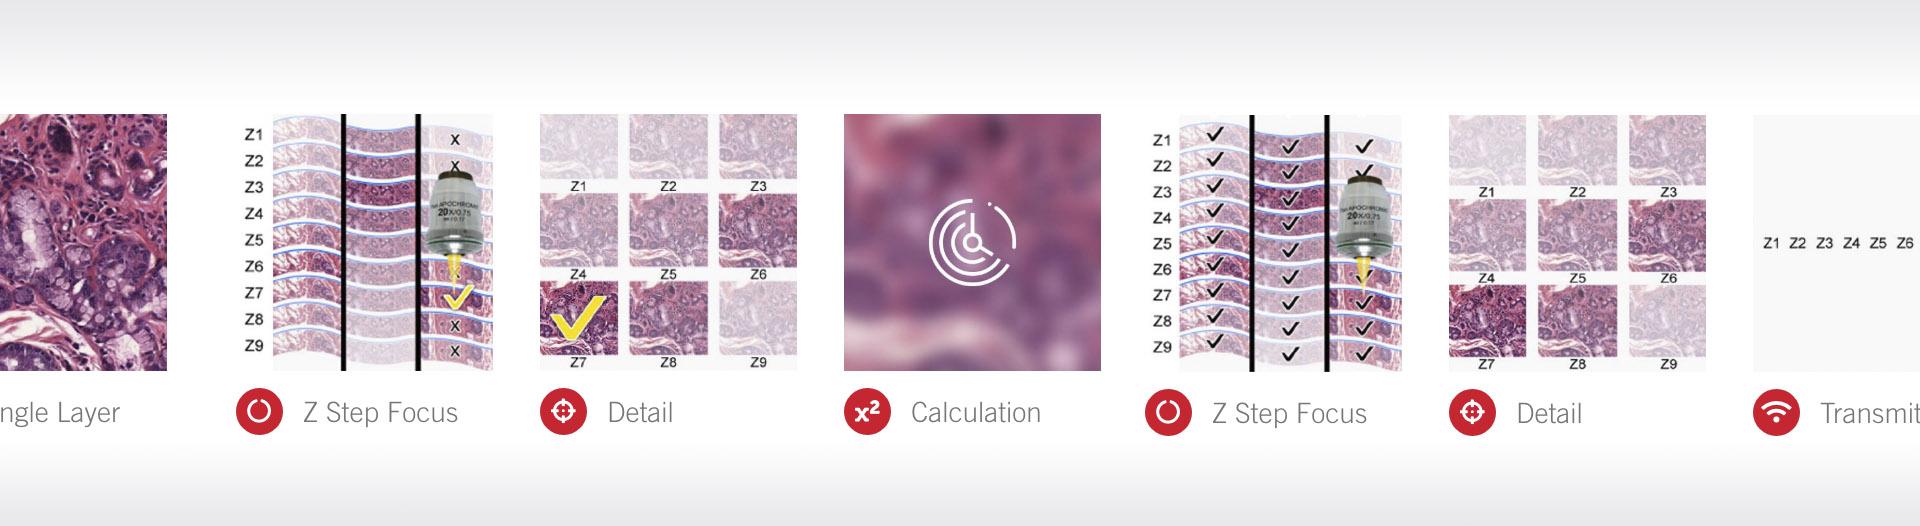 MoticEasyScan scanning modes